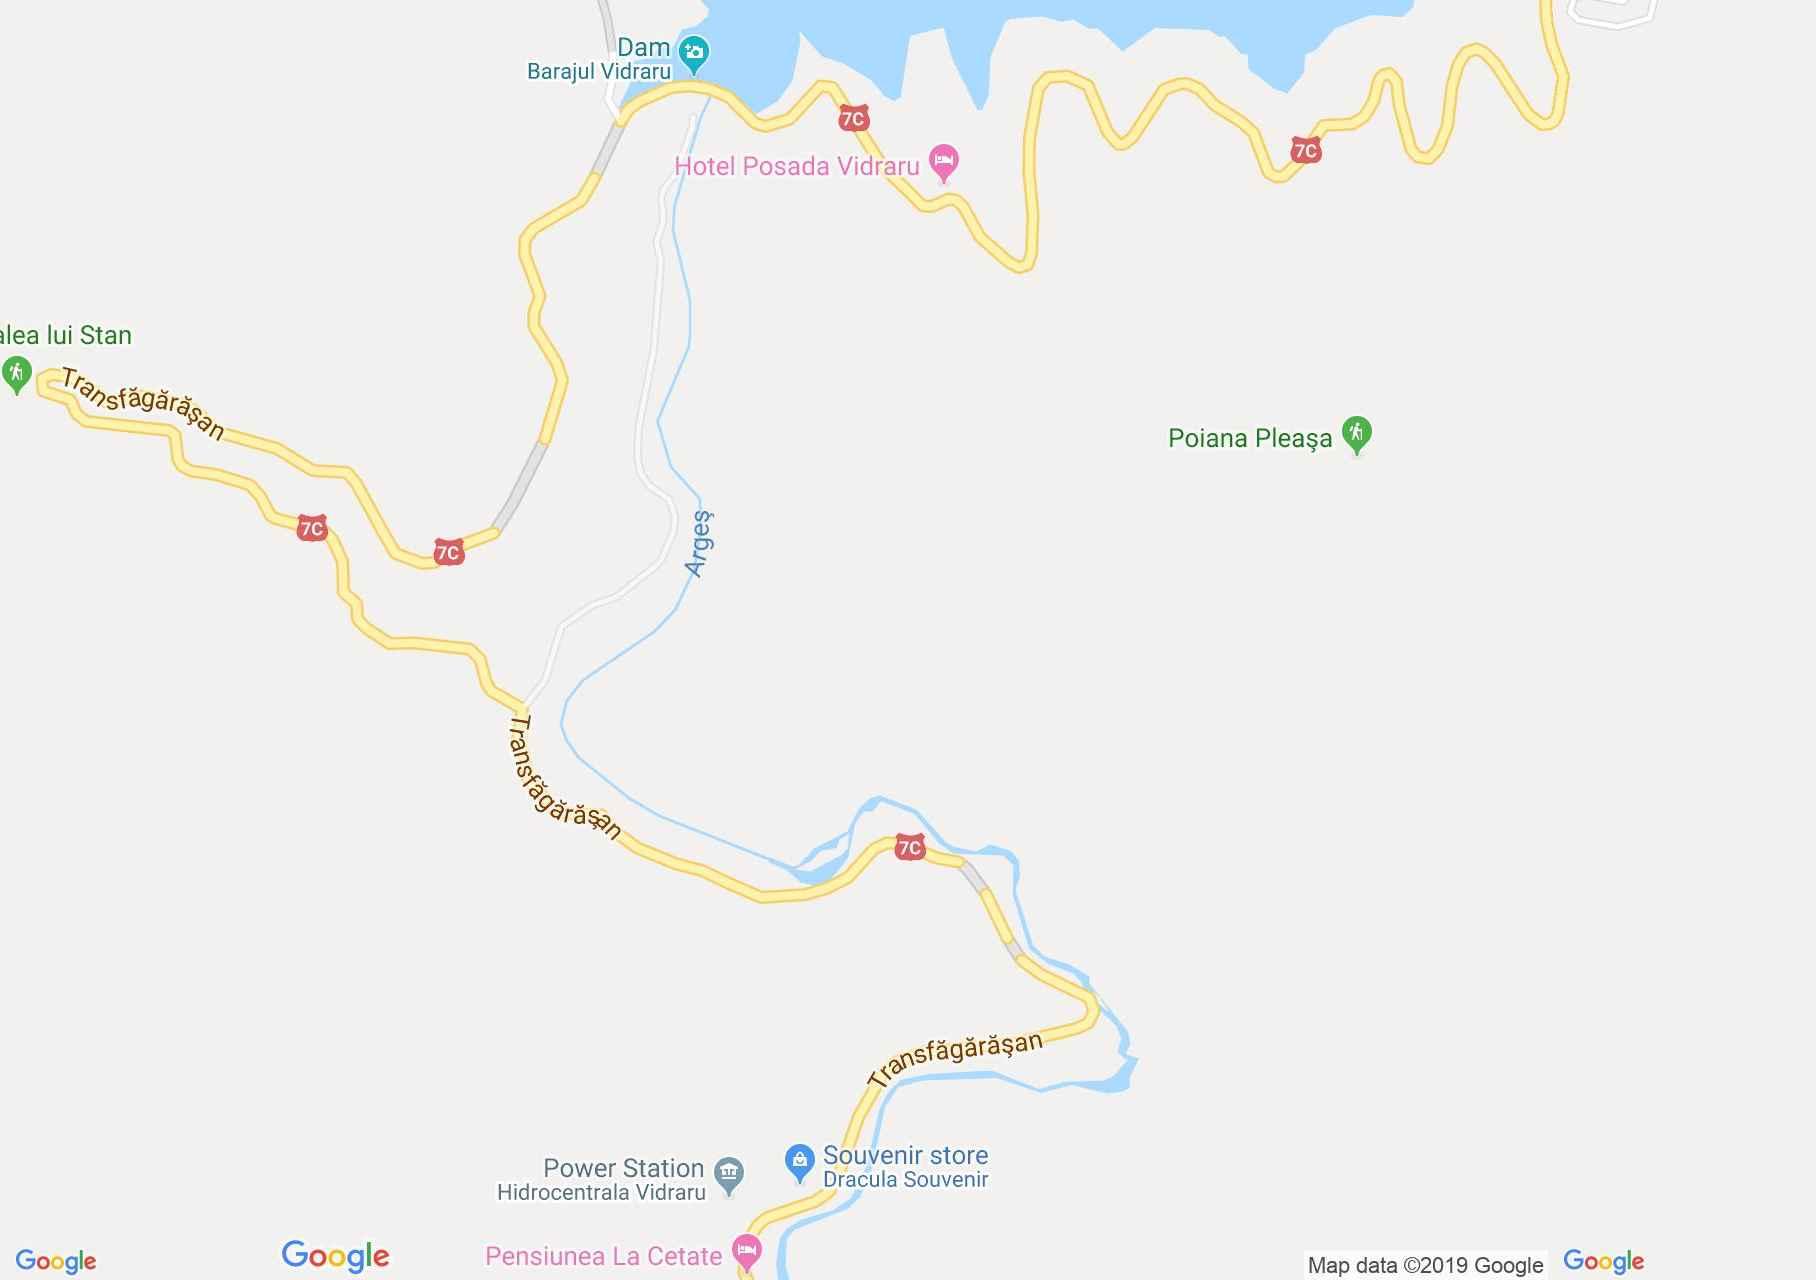 Map of DN7c: Poenari fortress